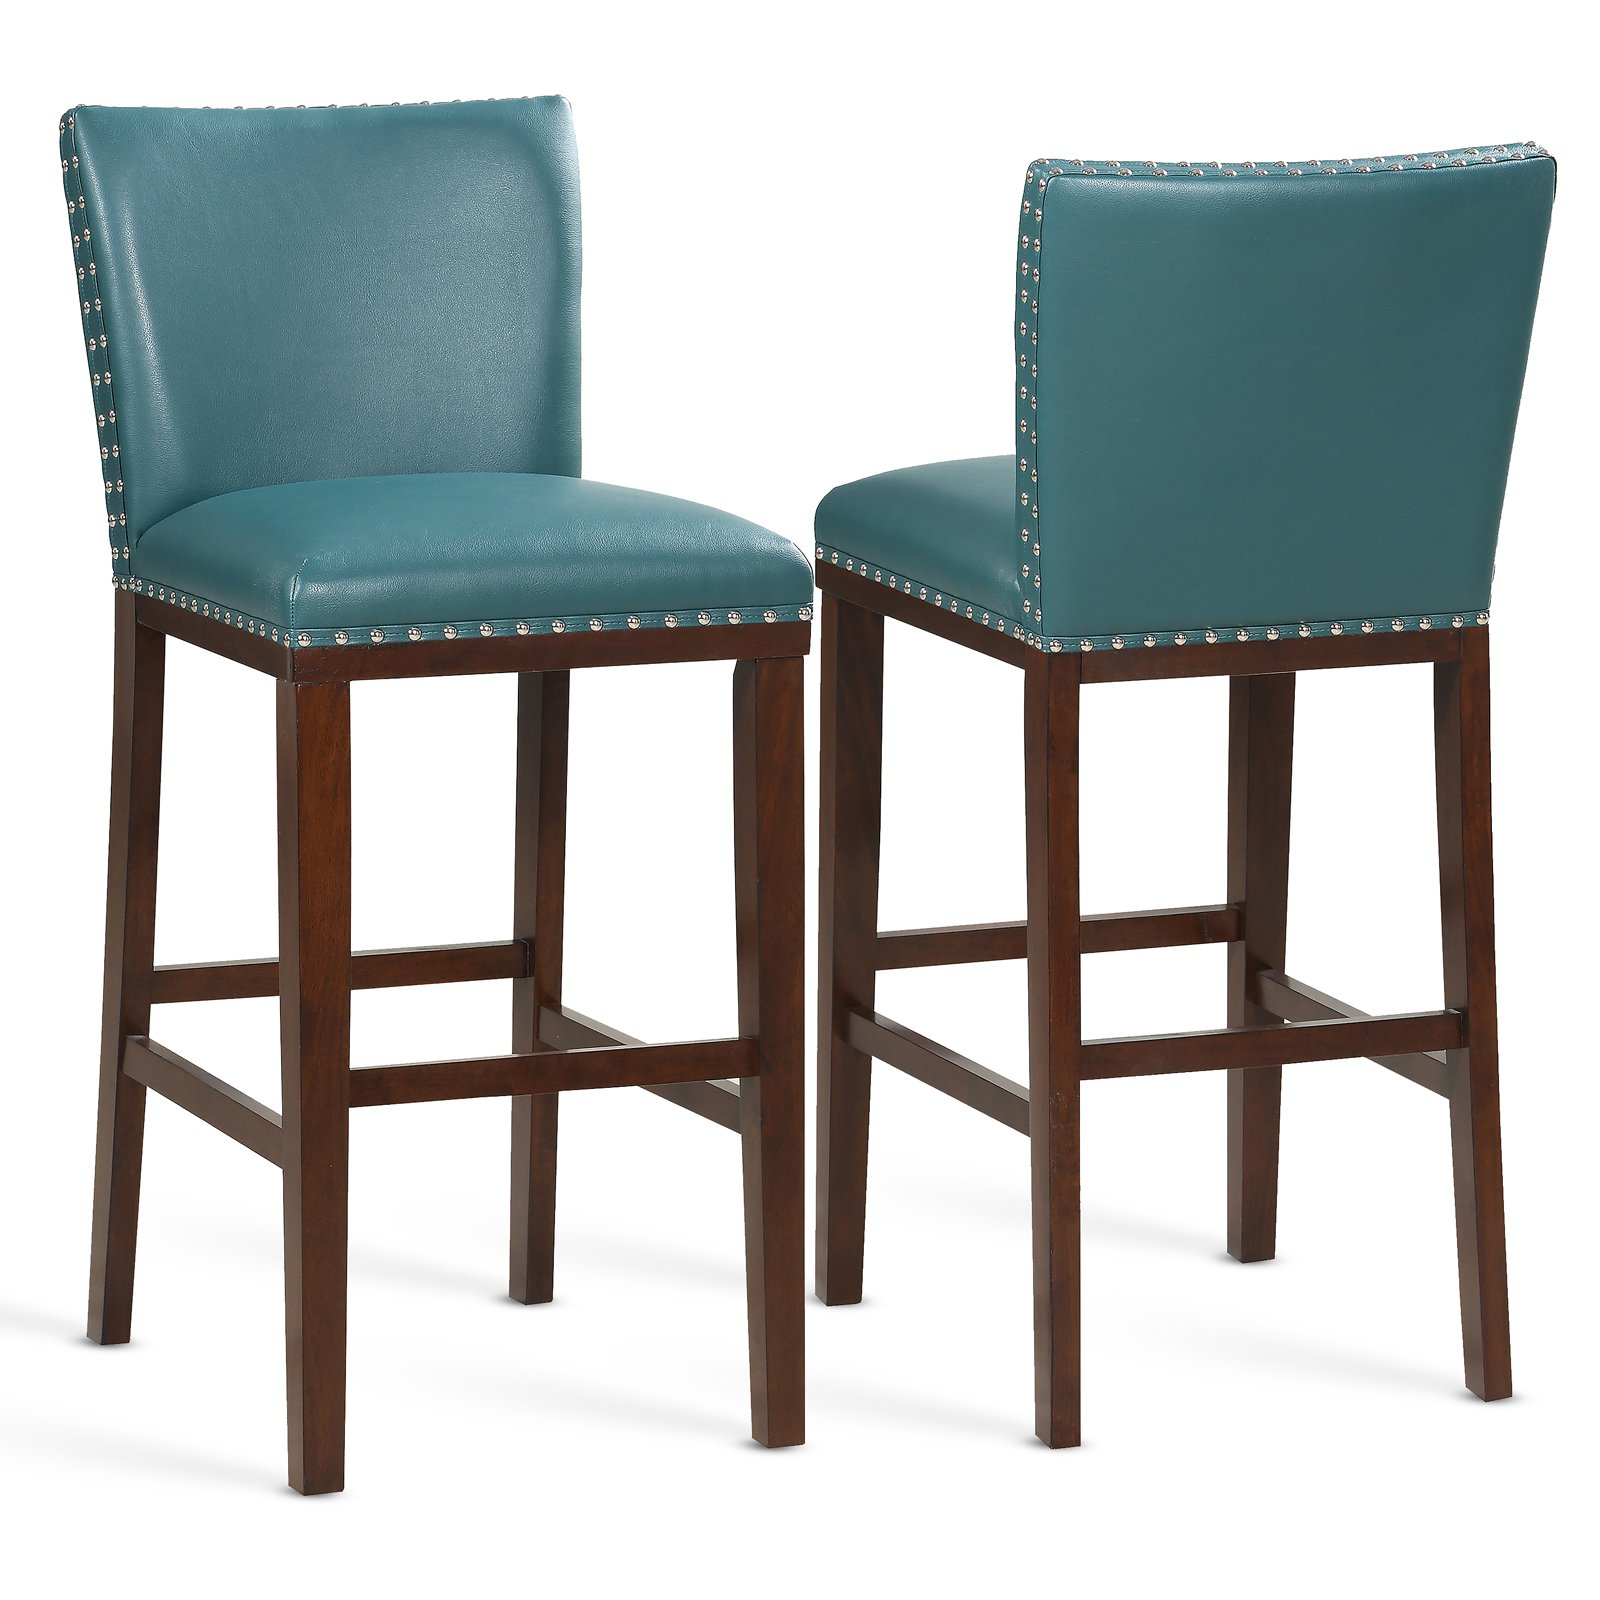 Fabulous Steve Silver Co Tiffany Barstool Set Of 2 Peacock Ibusinesslaw Wood Chair Design Ideas Ibusinesslaworg